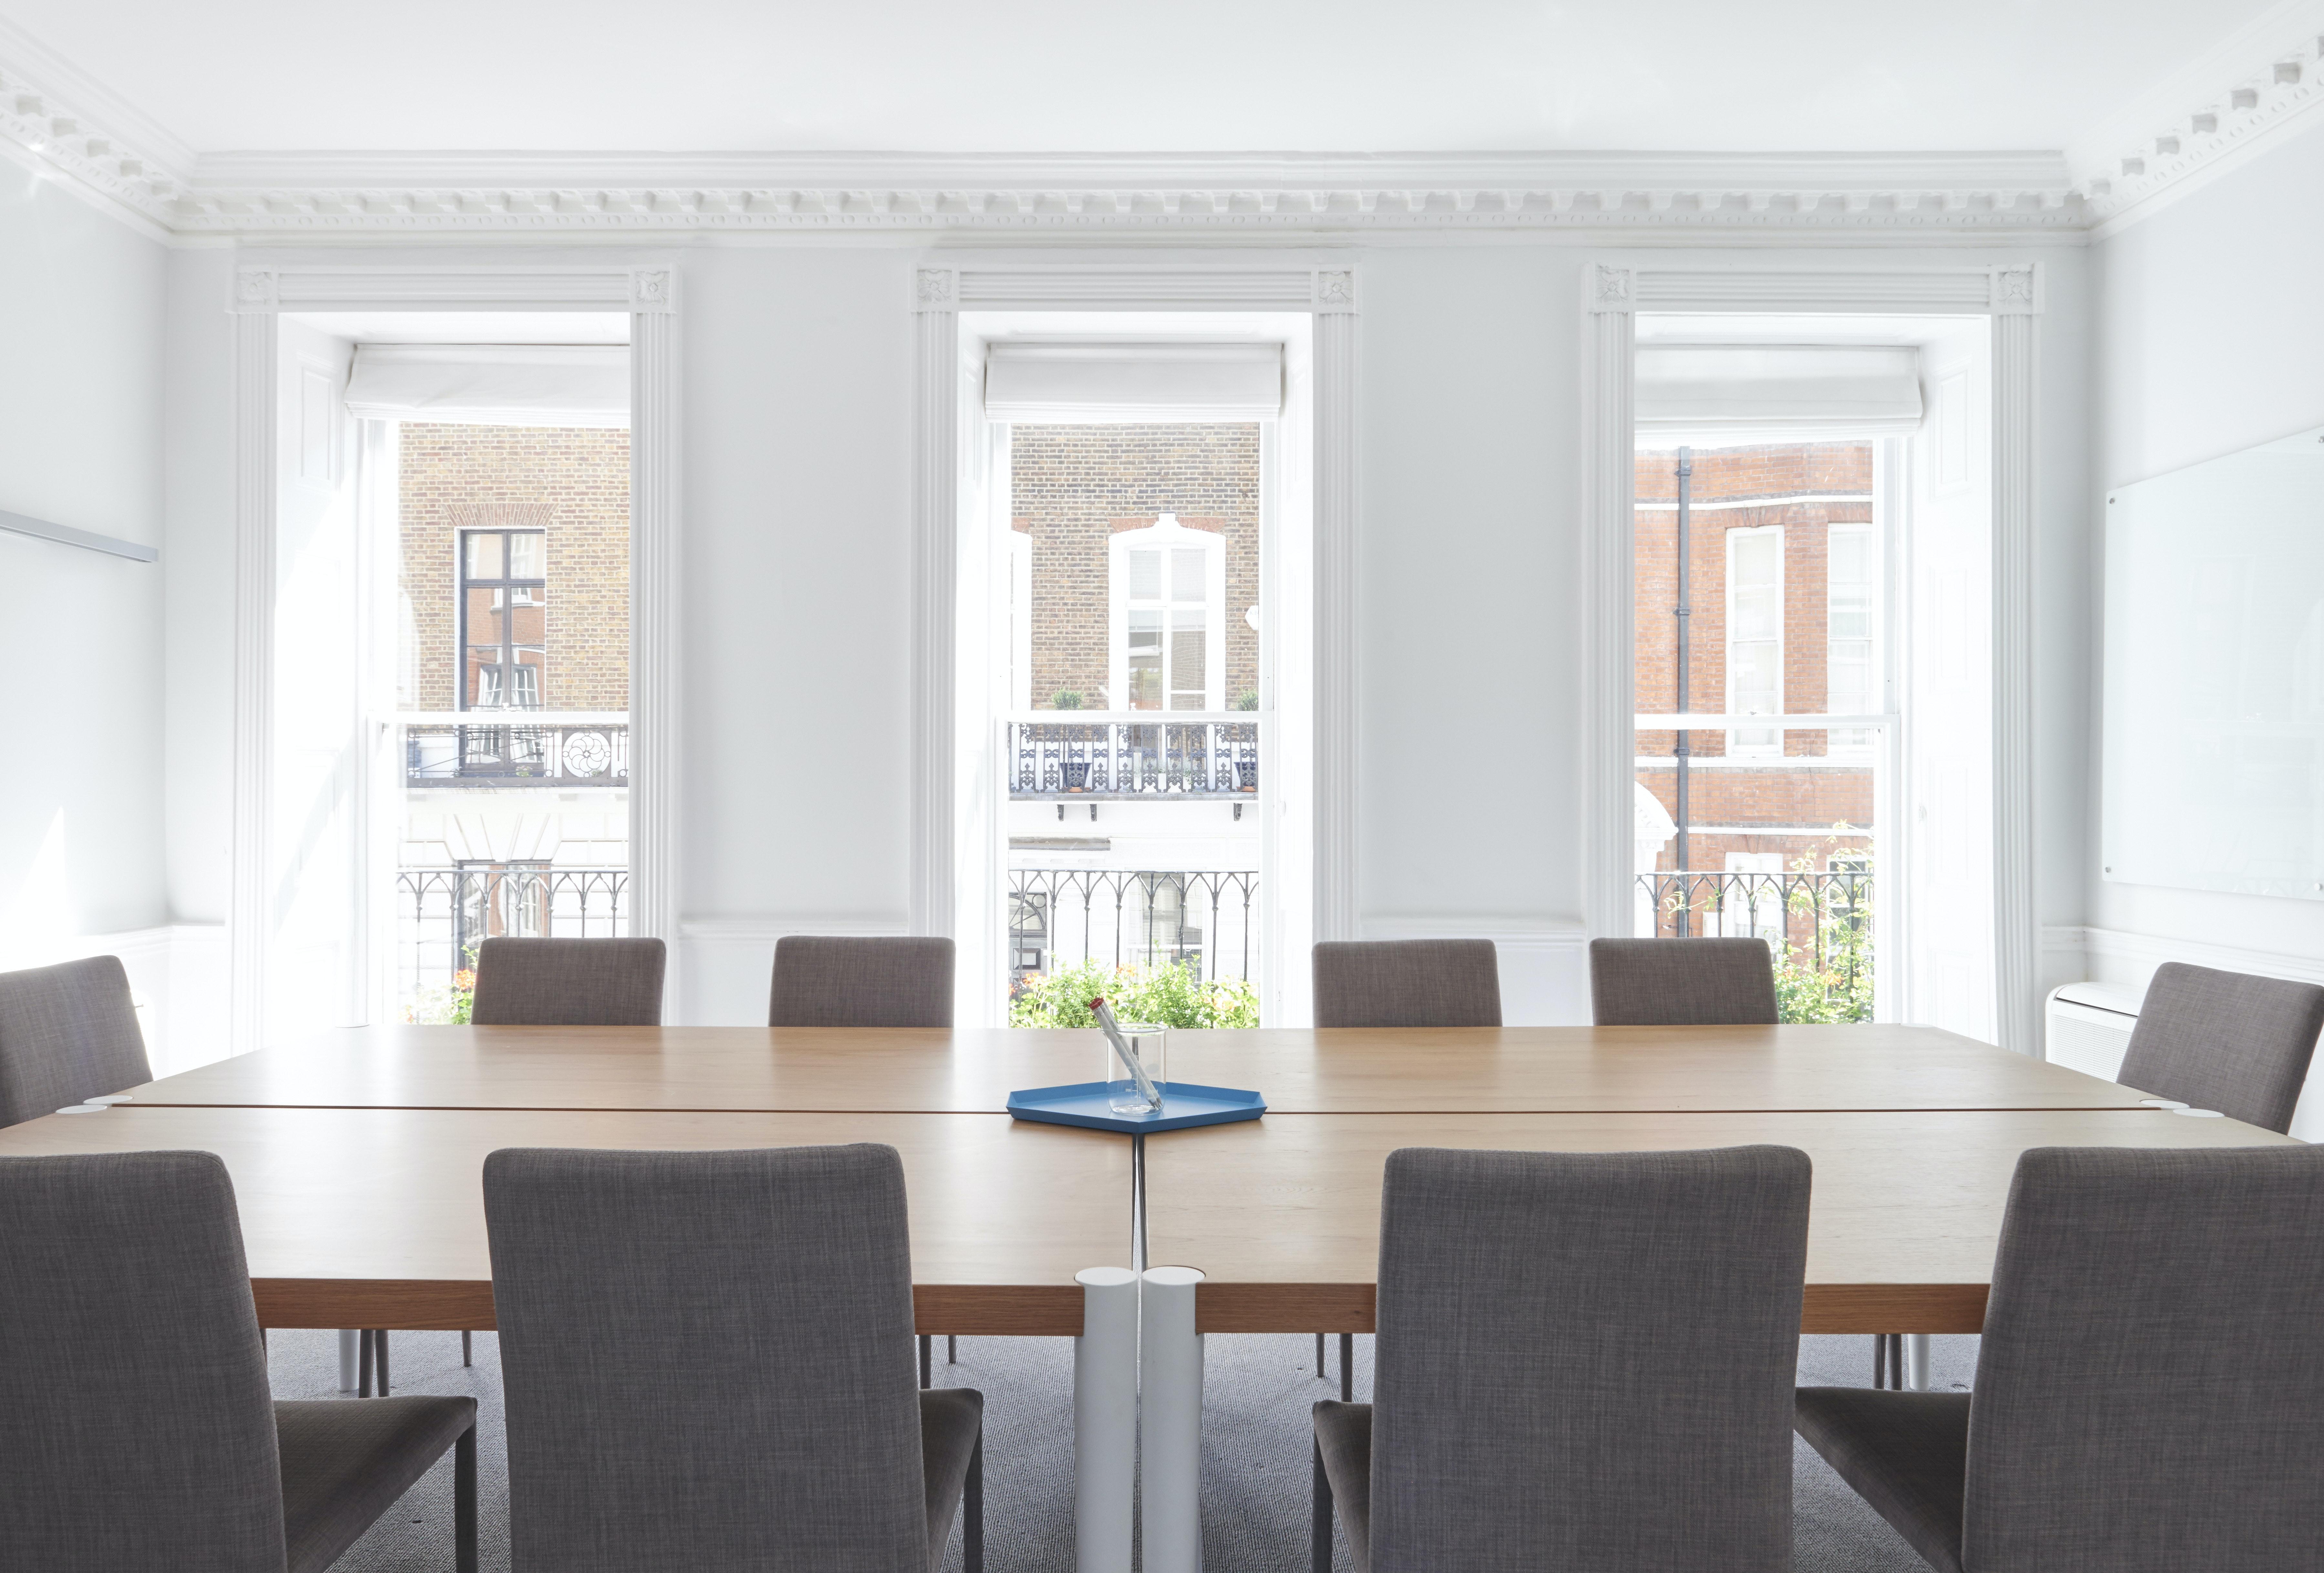 presentation space at 44 Welbeck Street, Marylebone ,London